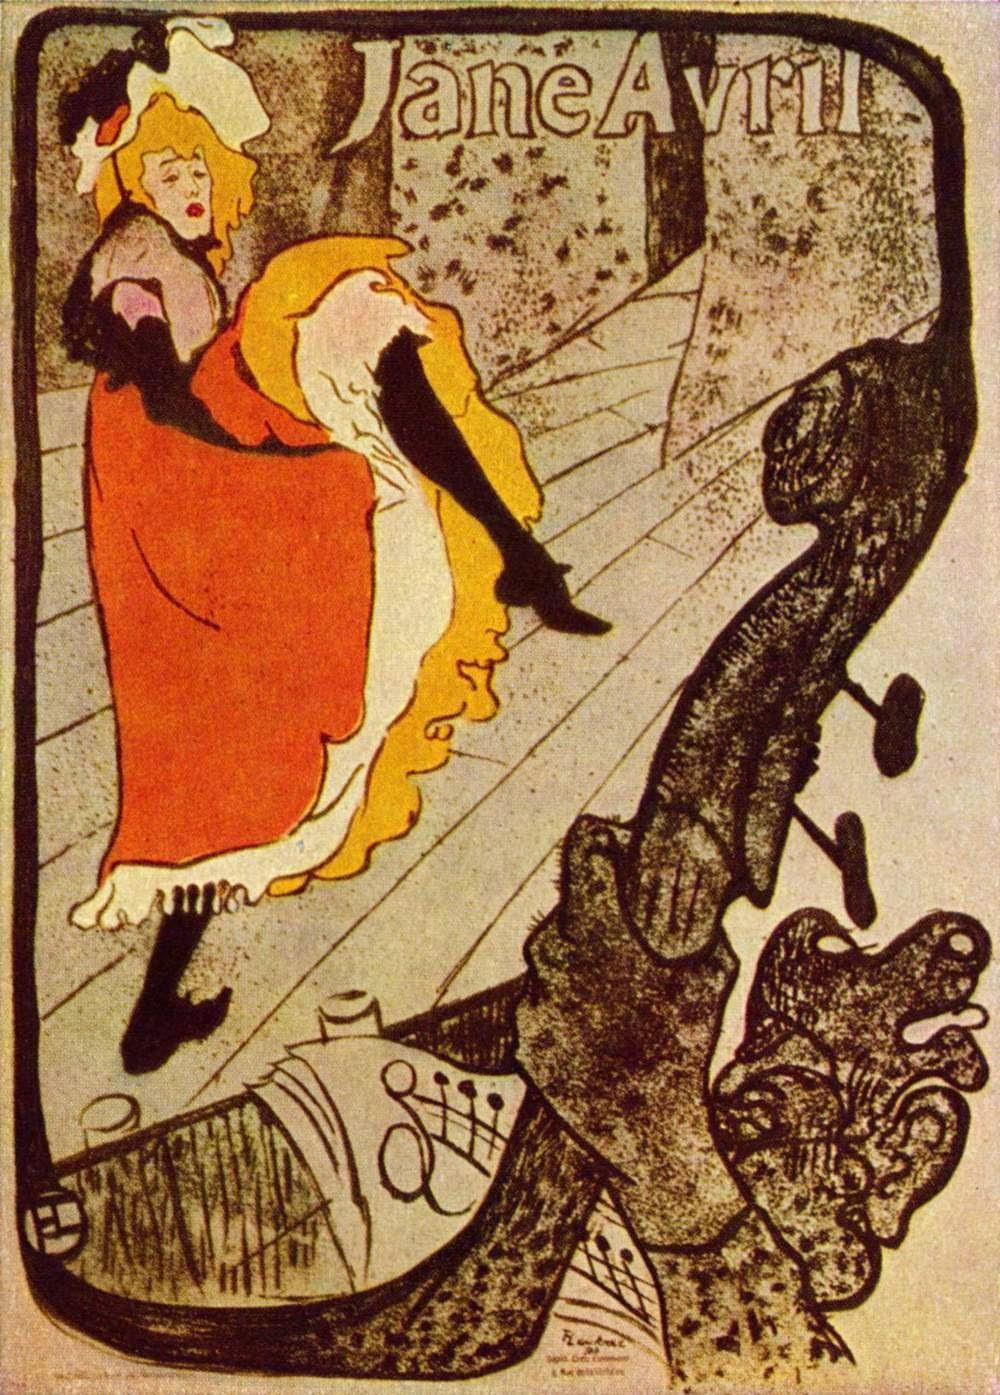 henri de toulouse lautrec essay Henri de toulouse-lautrec french, 1864–1901 at the moulin rouge 1892/95 oil on canvas 48 7/16 x 55 1/2 in (123 x 141 cm) stamped lower left with monogram.